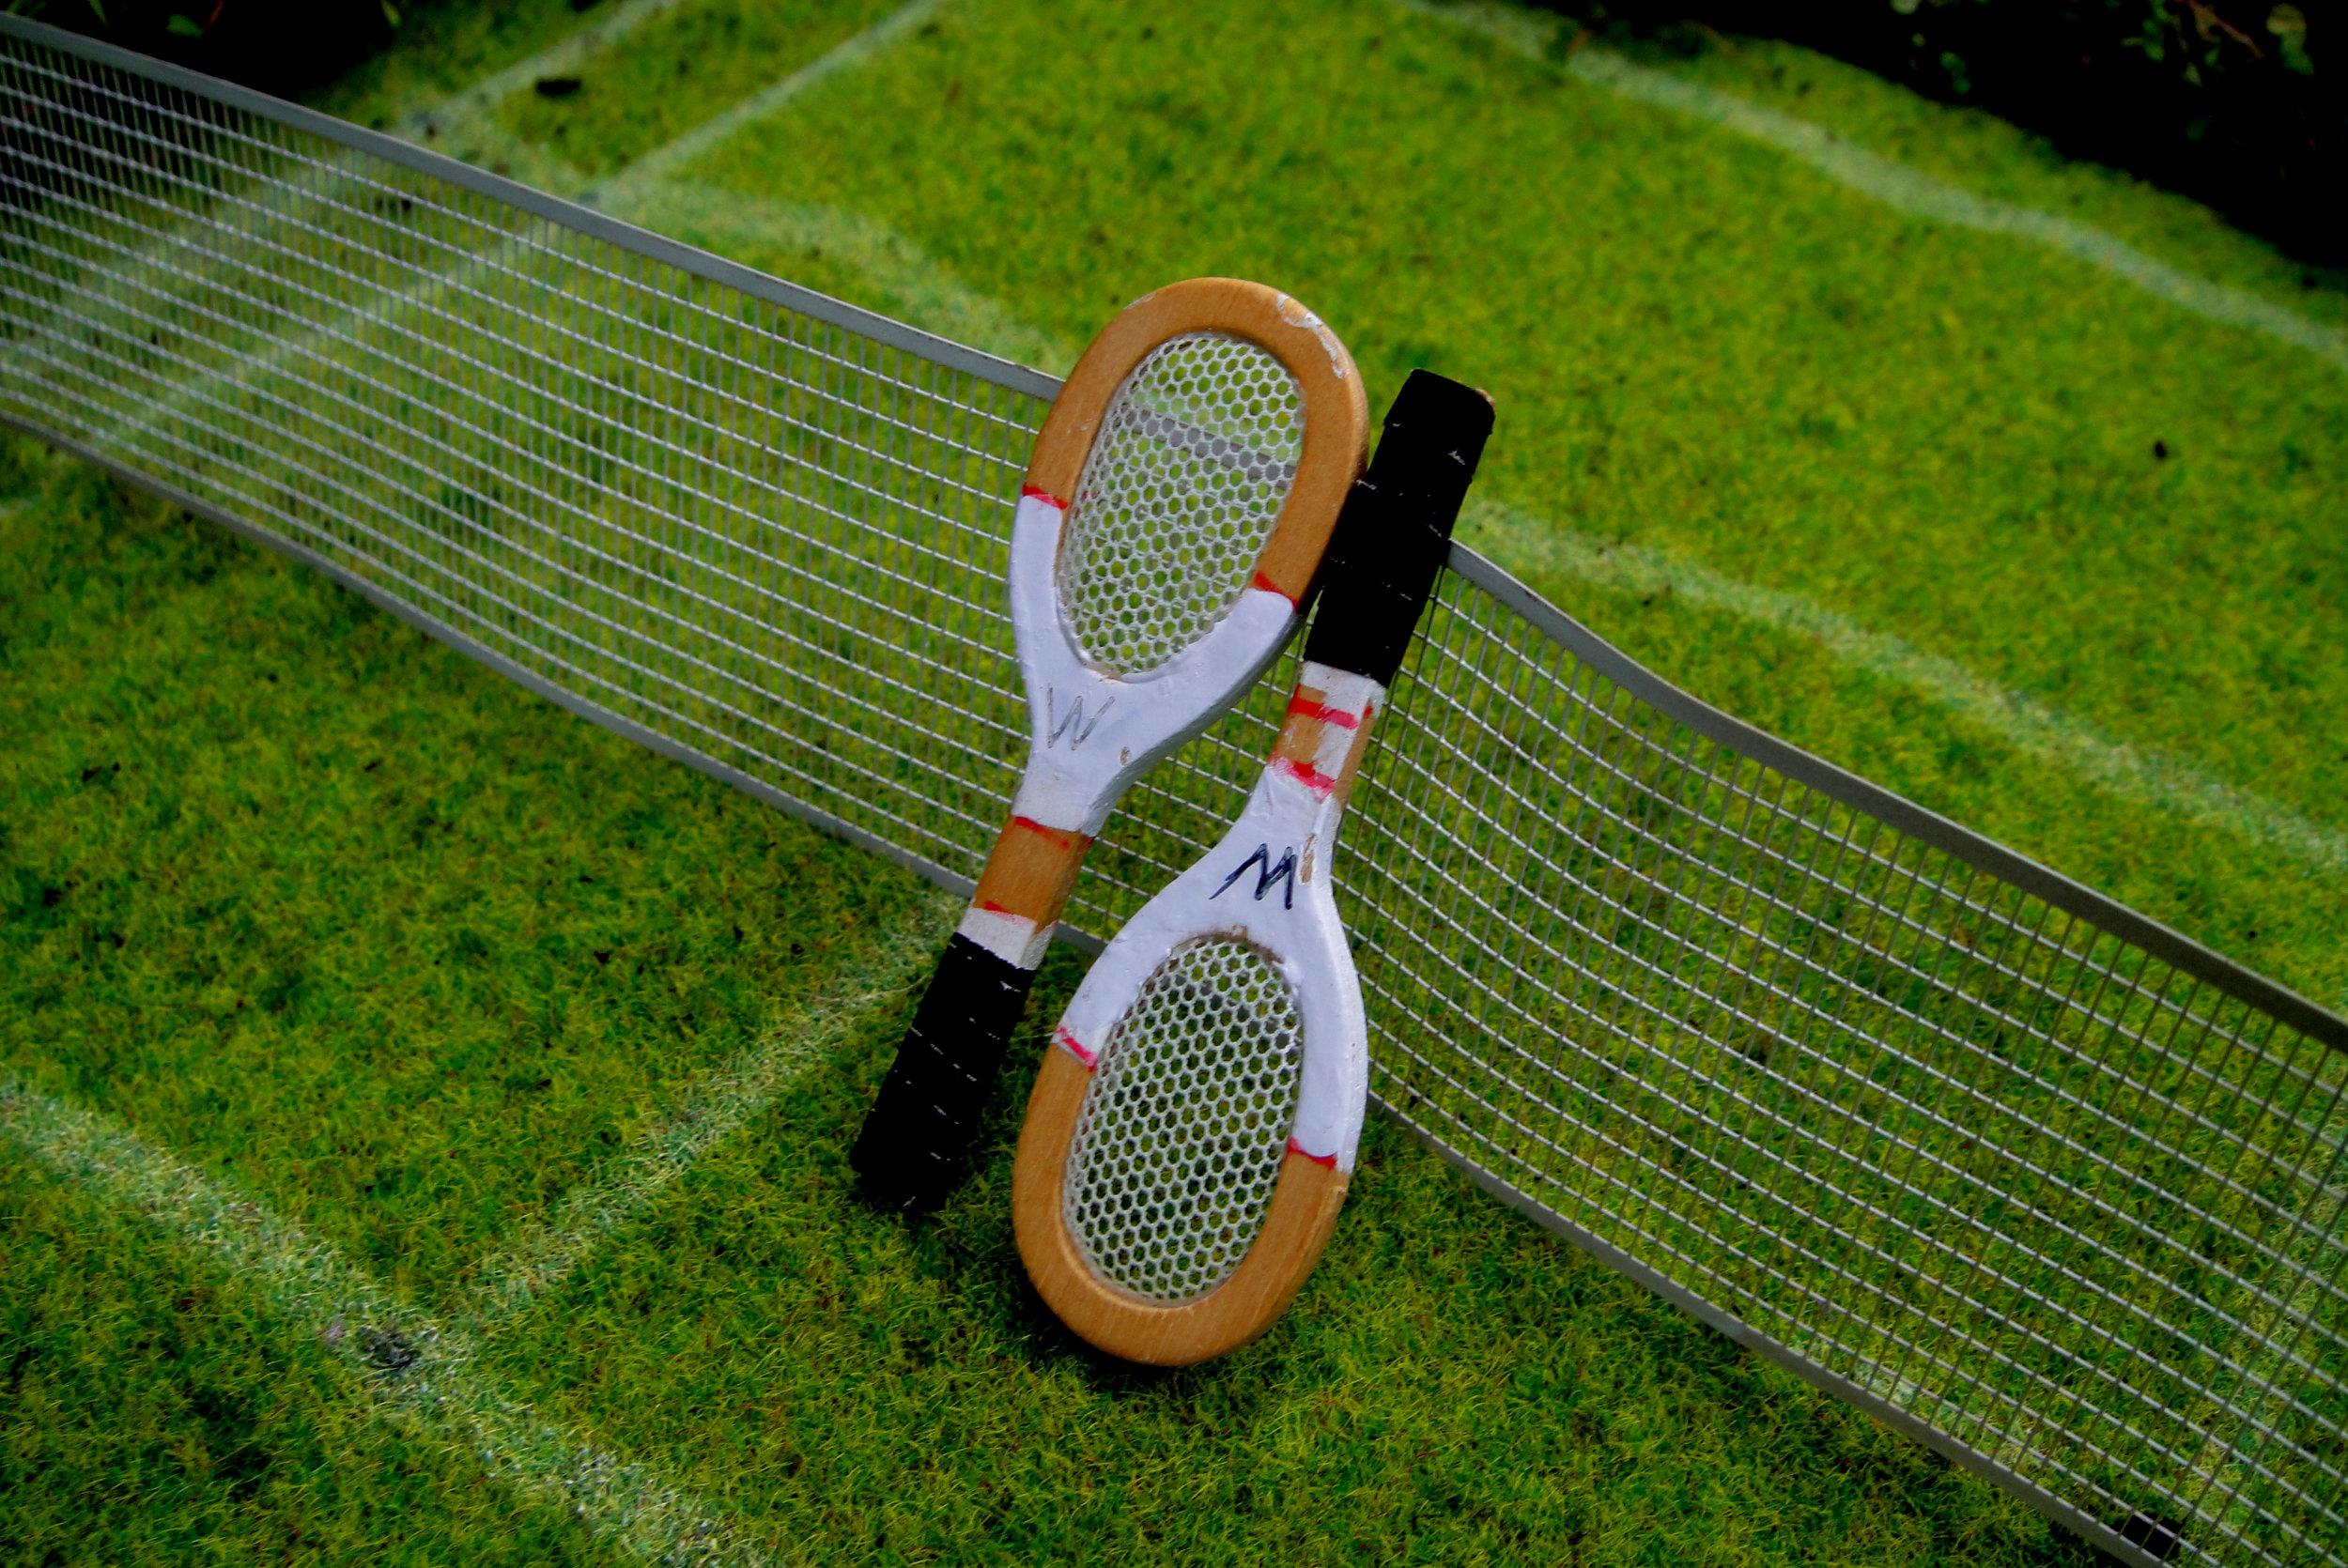 wimbledon tennis London pothole garden CU raquet